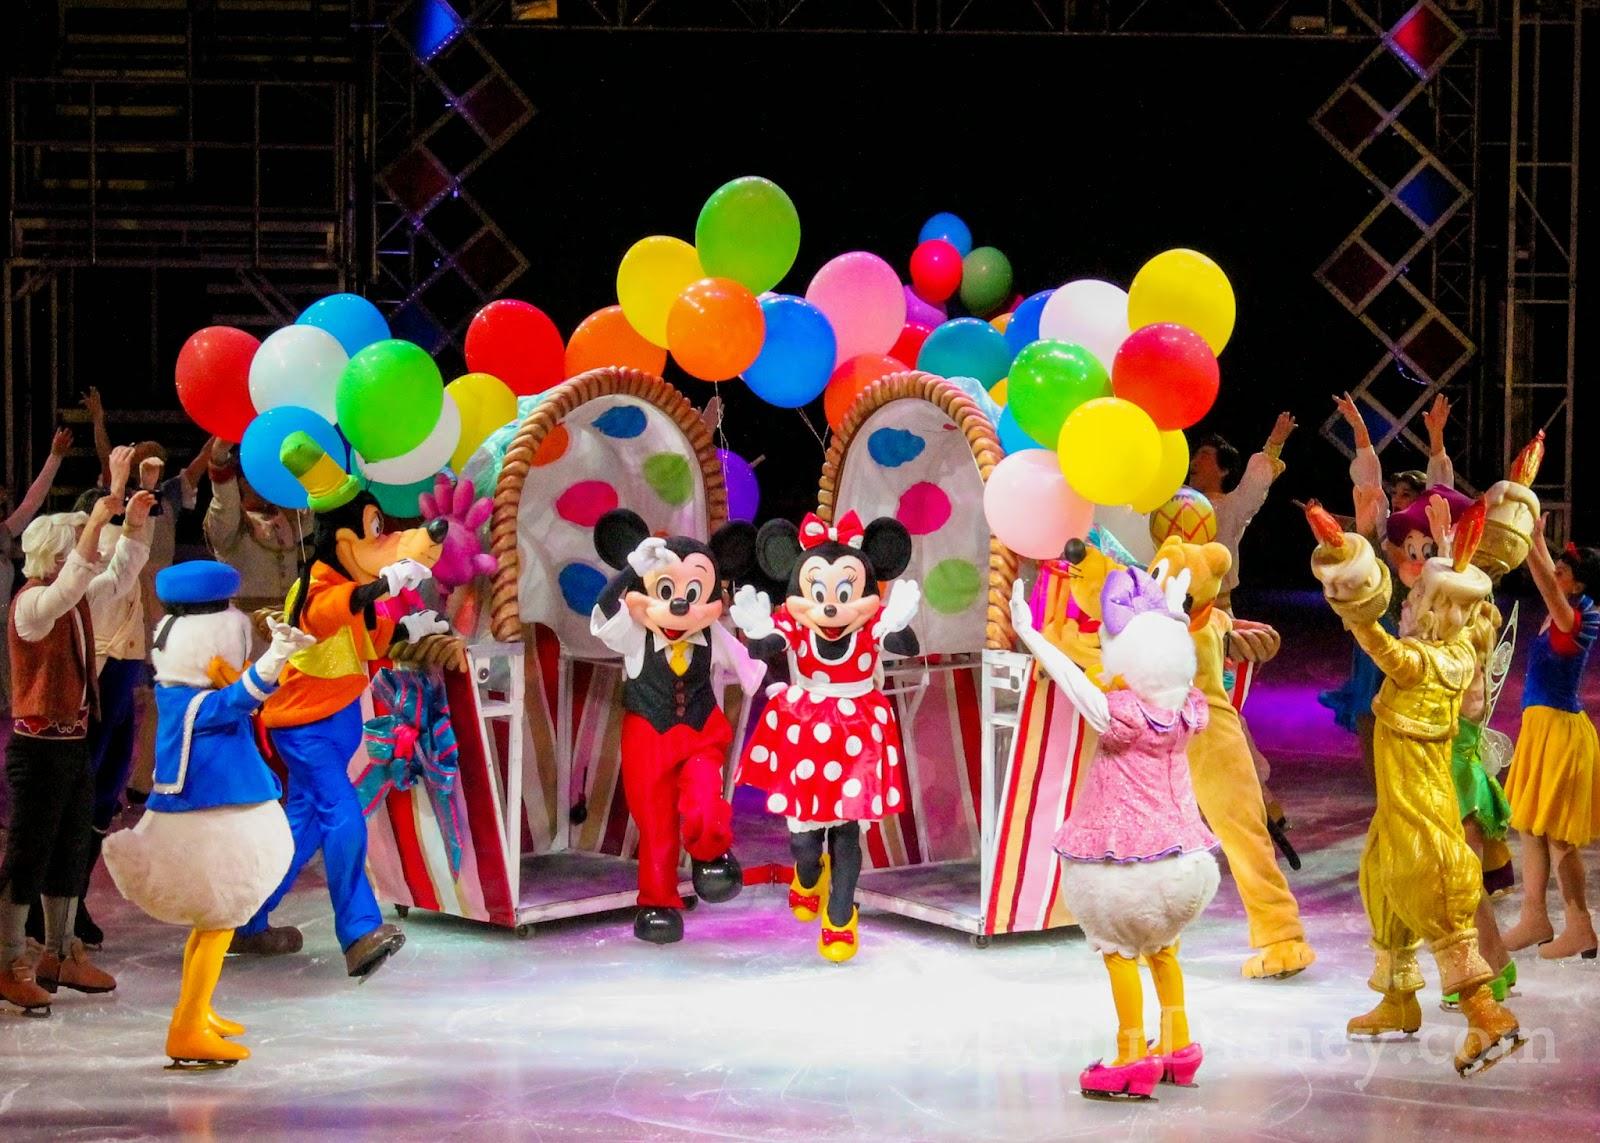 LoveOurDisney.com reviews Disney On Ice presents Let's Celebrate!